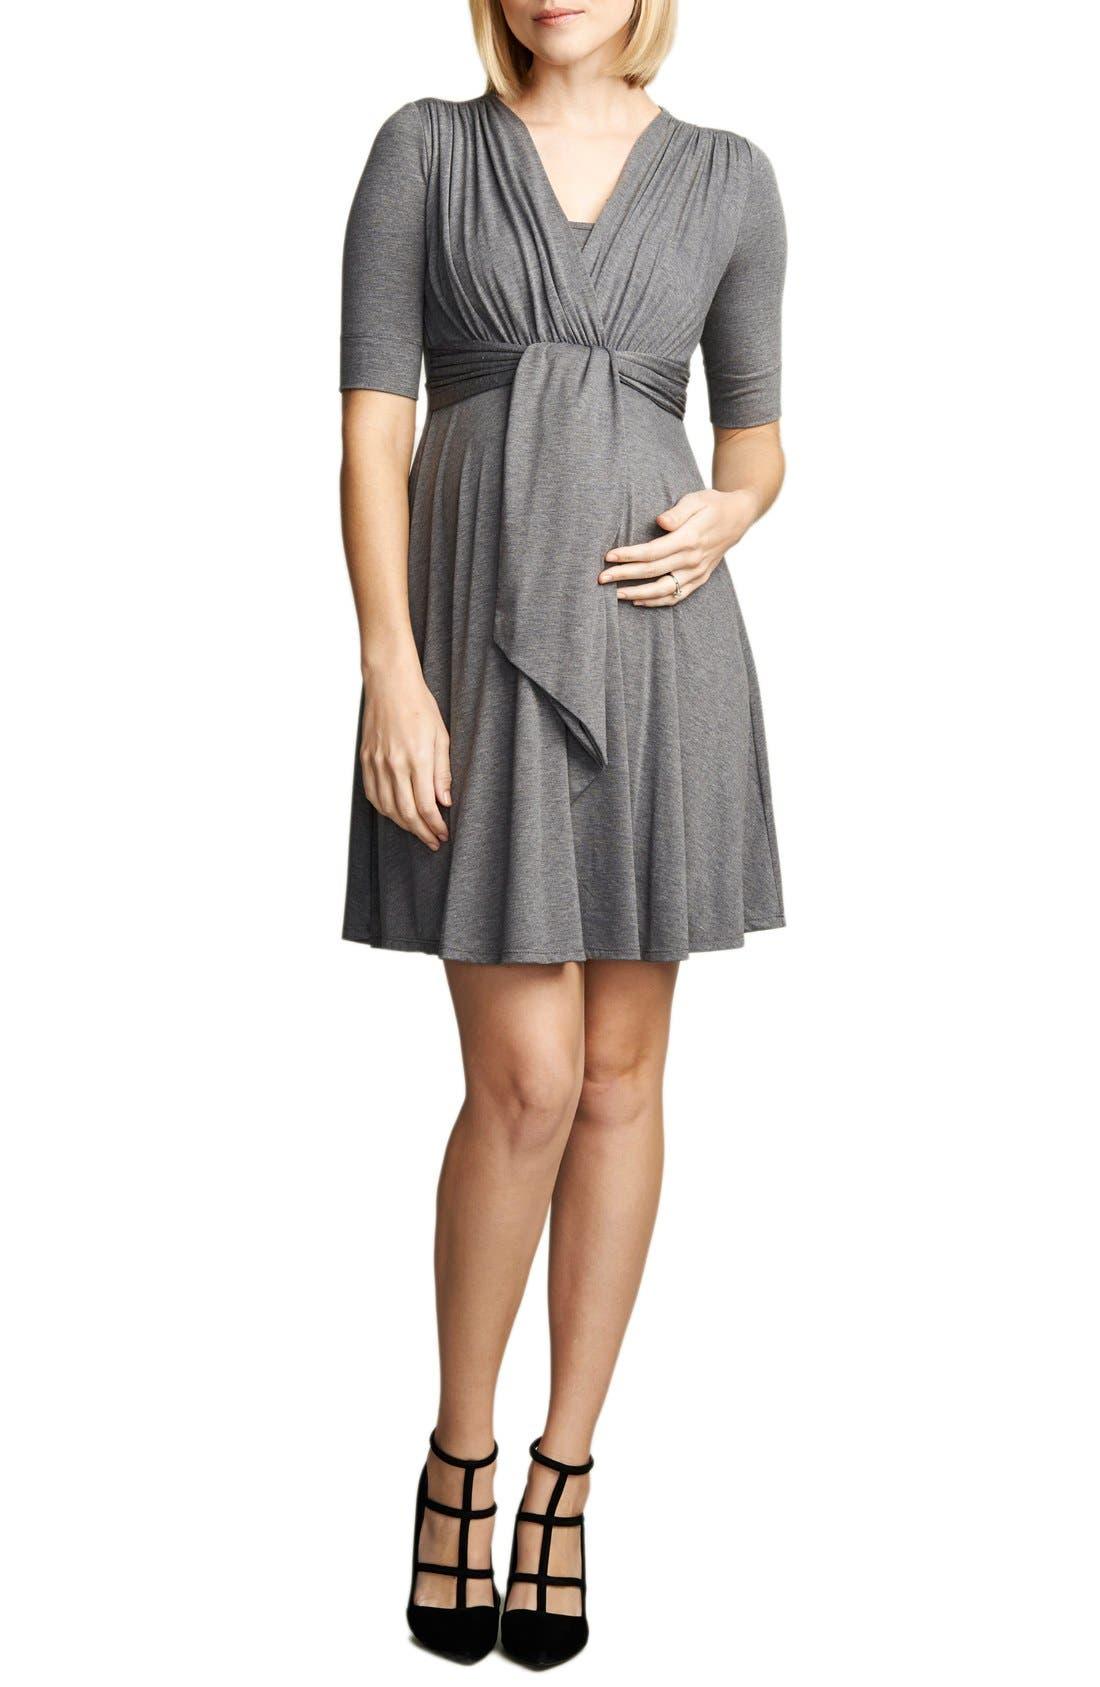 Alternate Image 1 Selected - Maternal America Front Tie Nursing Dress